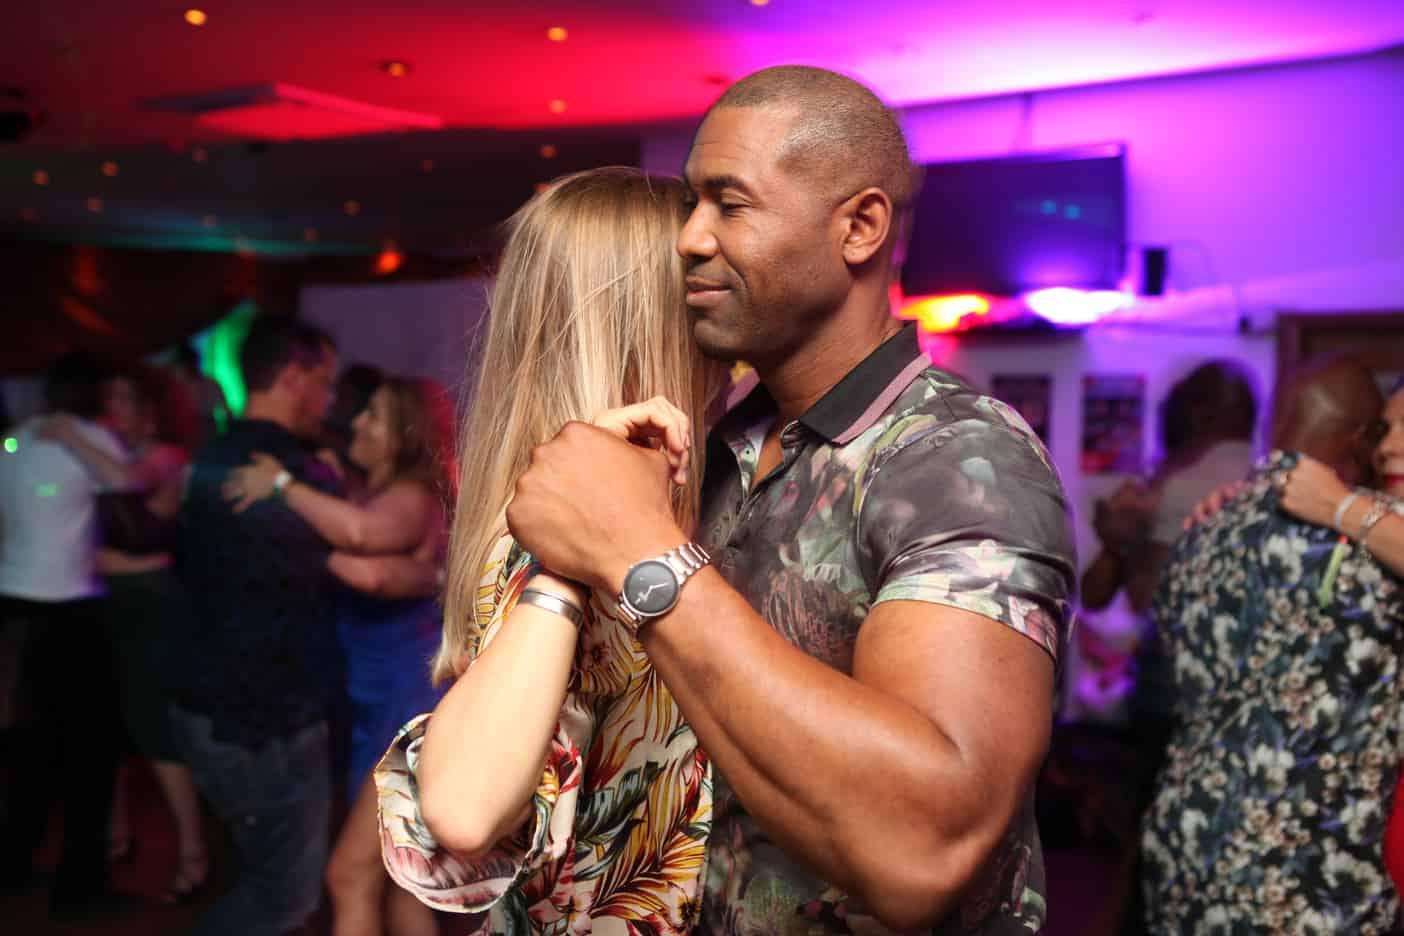 Man holding women's hand while dancing Kizomba